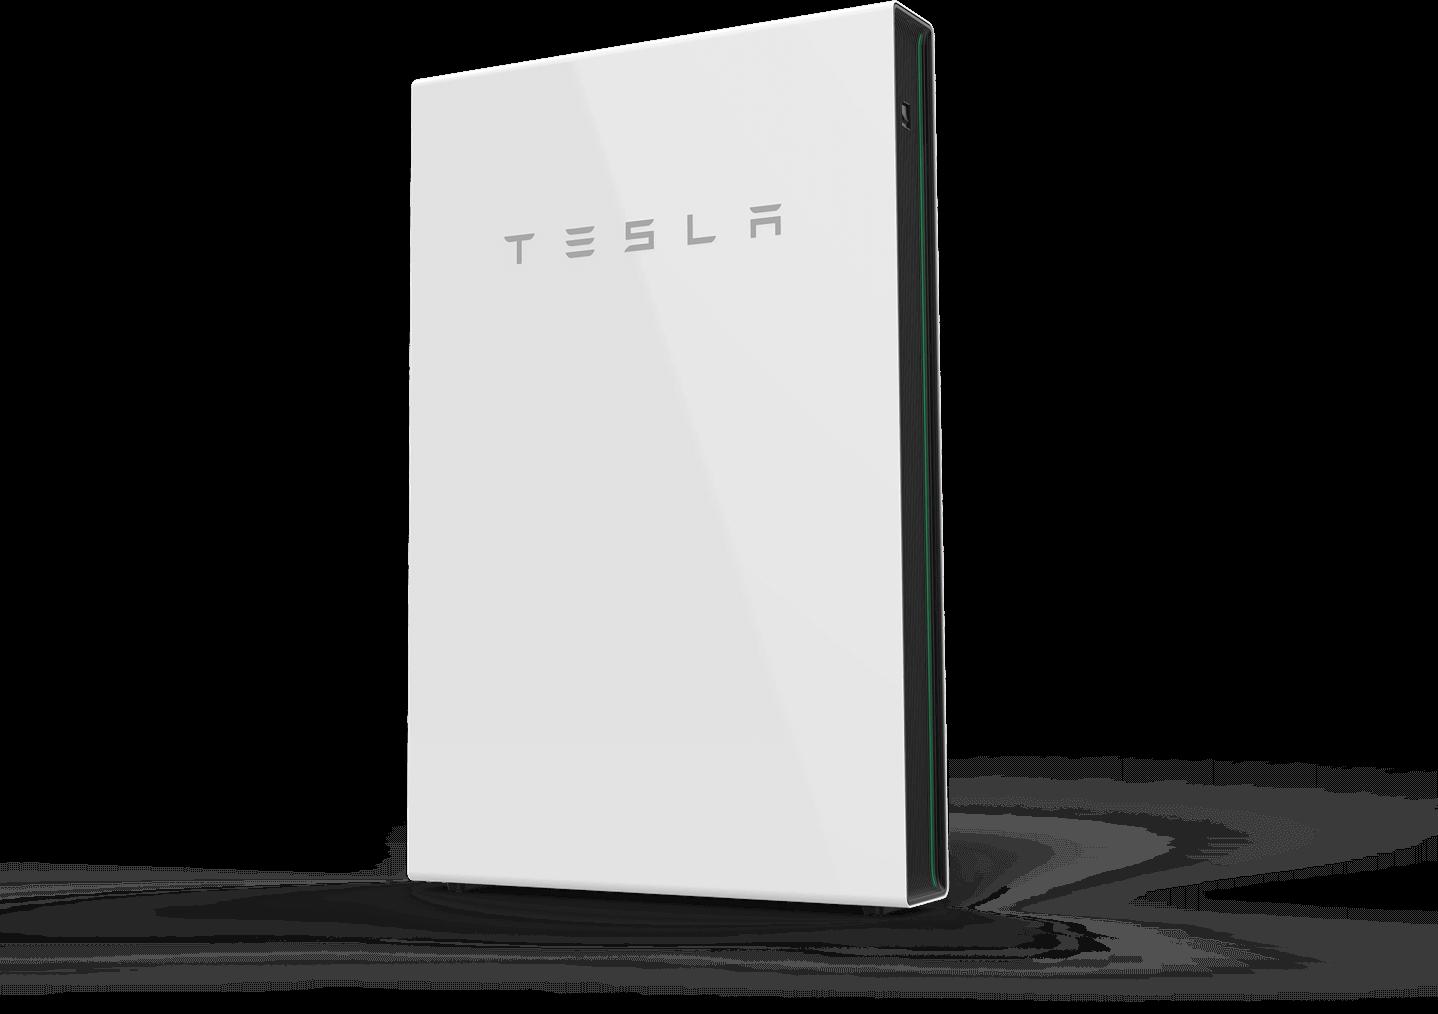 The Tesla Powerwall 2 model